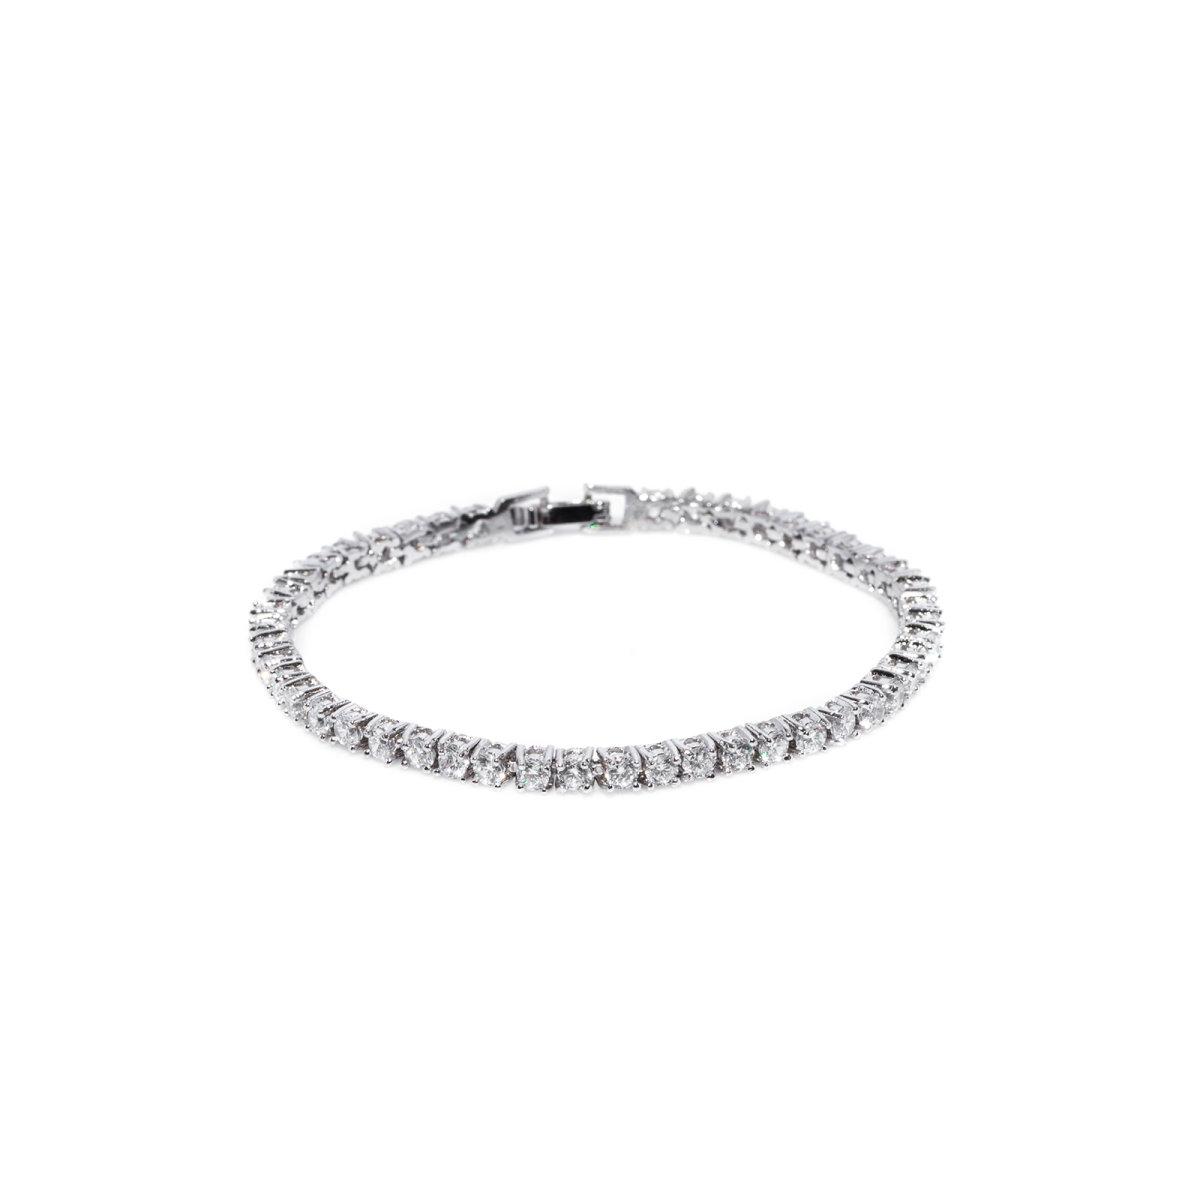 Bratara eleganta cu cristale de zirconiu cubic Argintiu